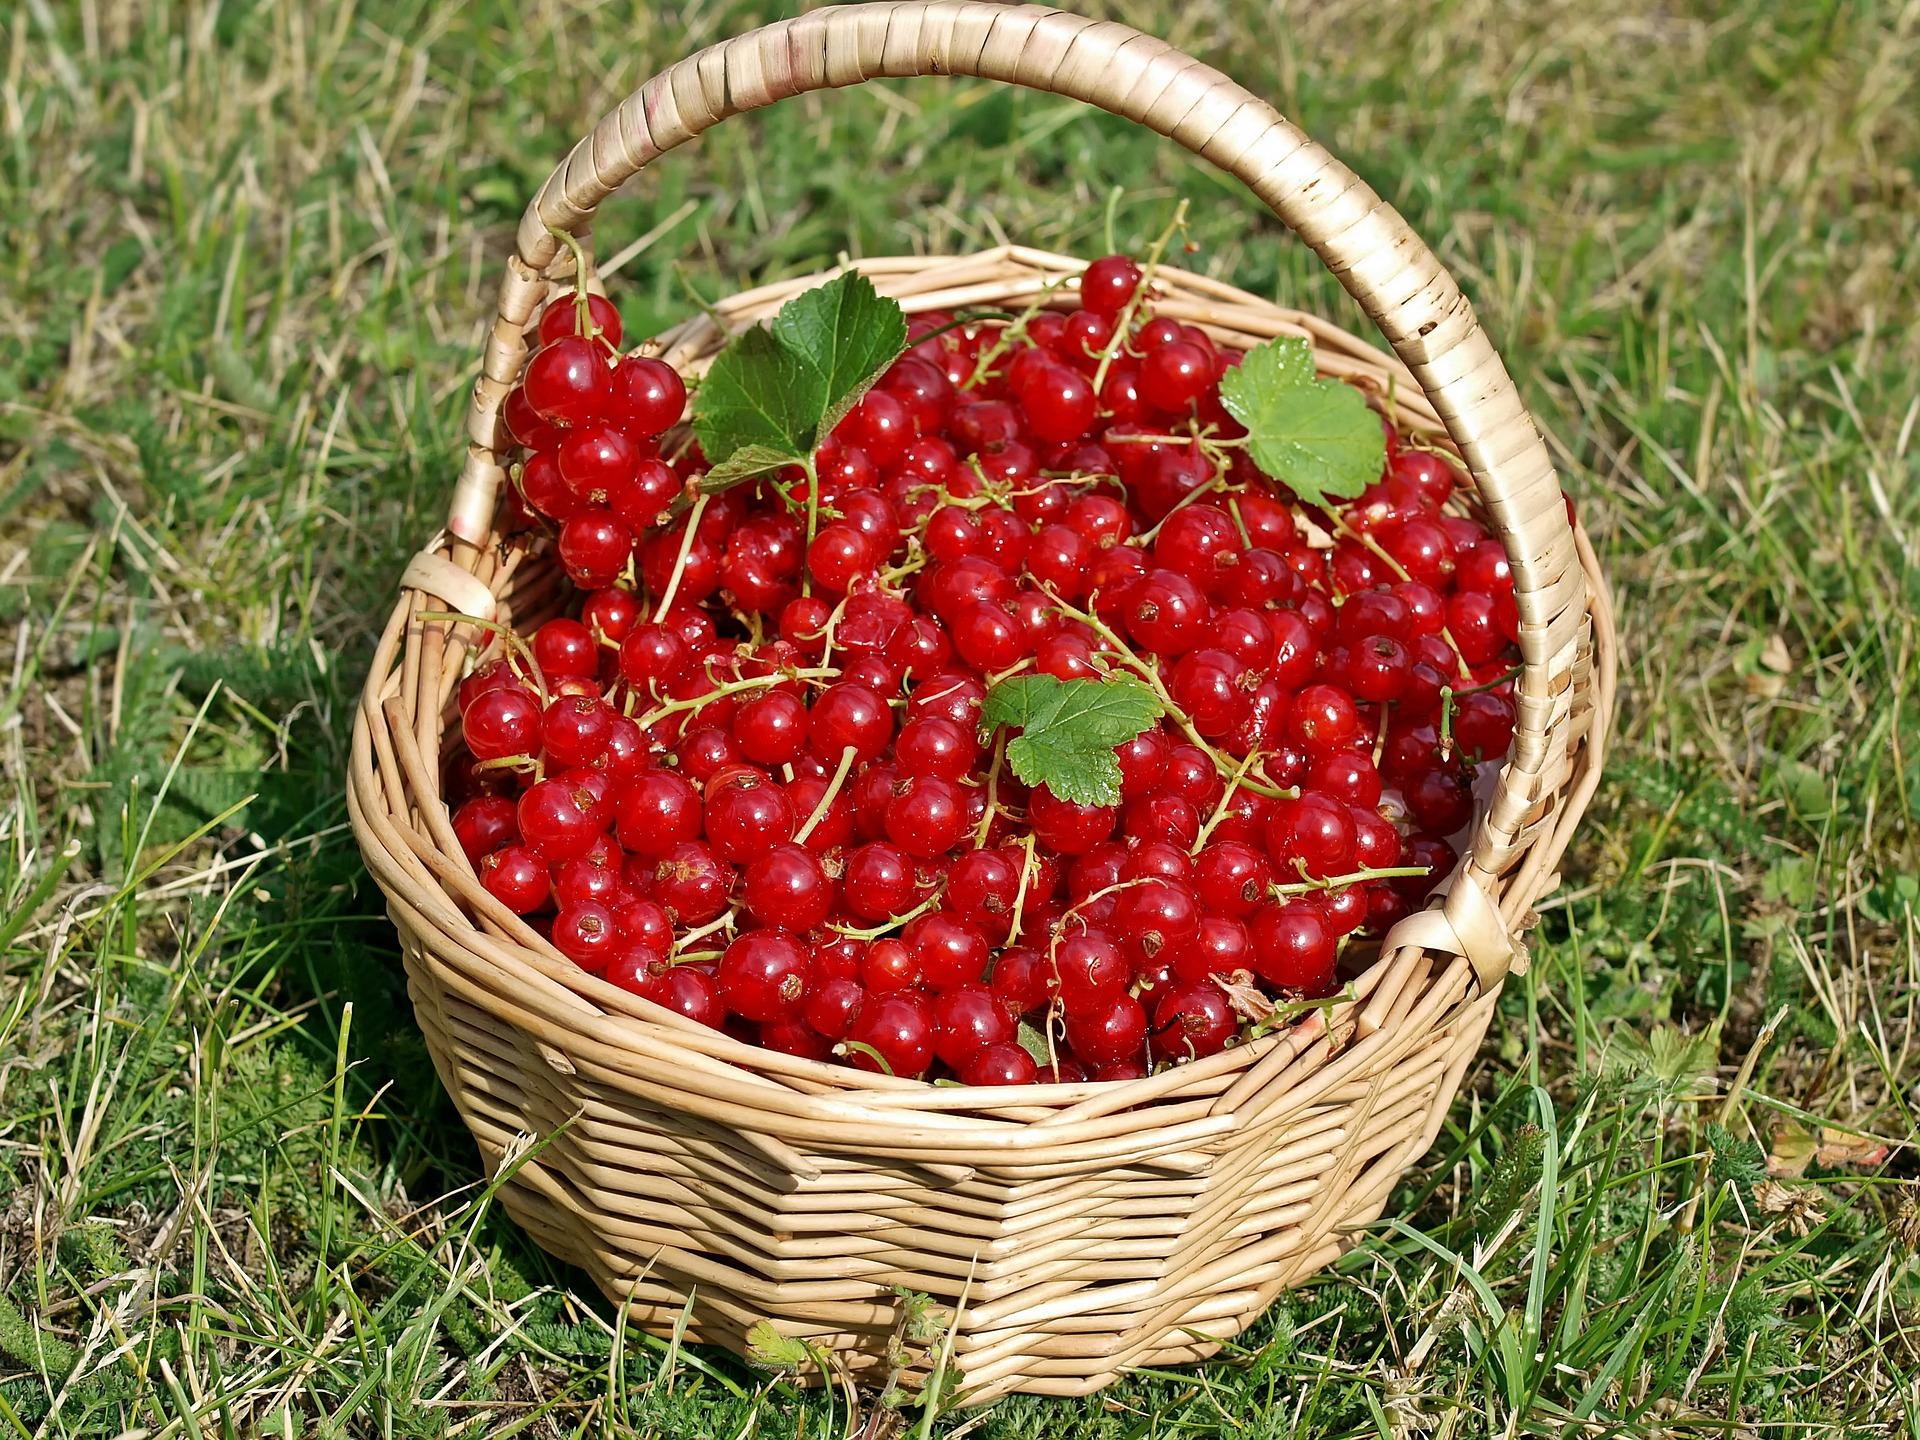 Red Currants, Basket, Currants, Food, Fruit, HQ Photo